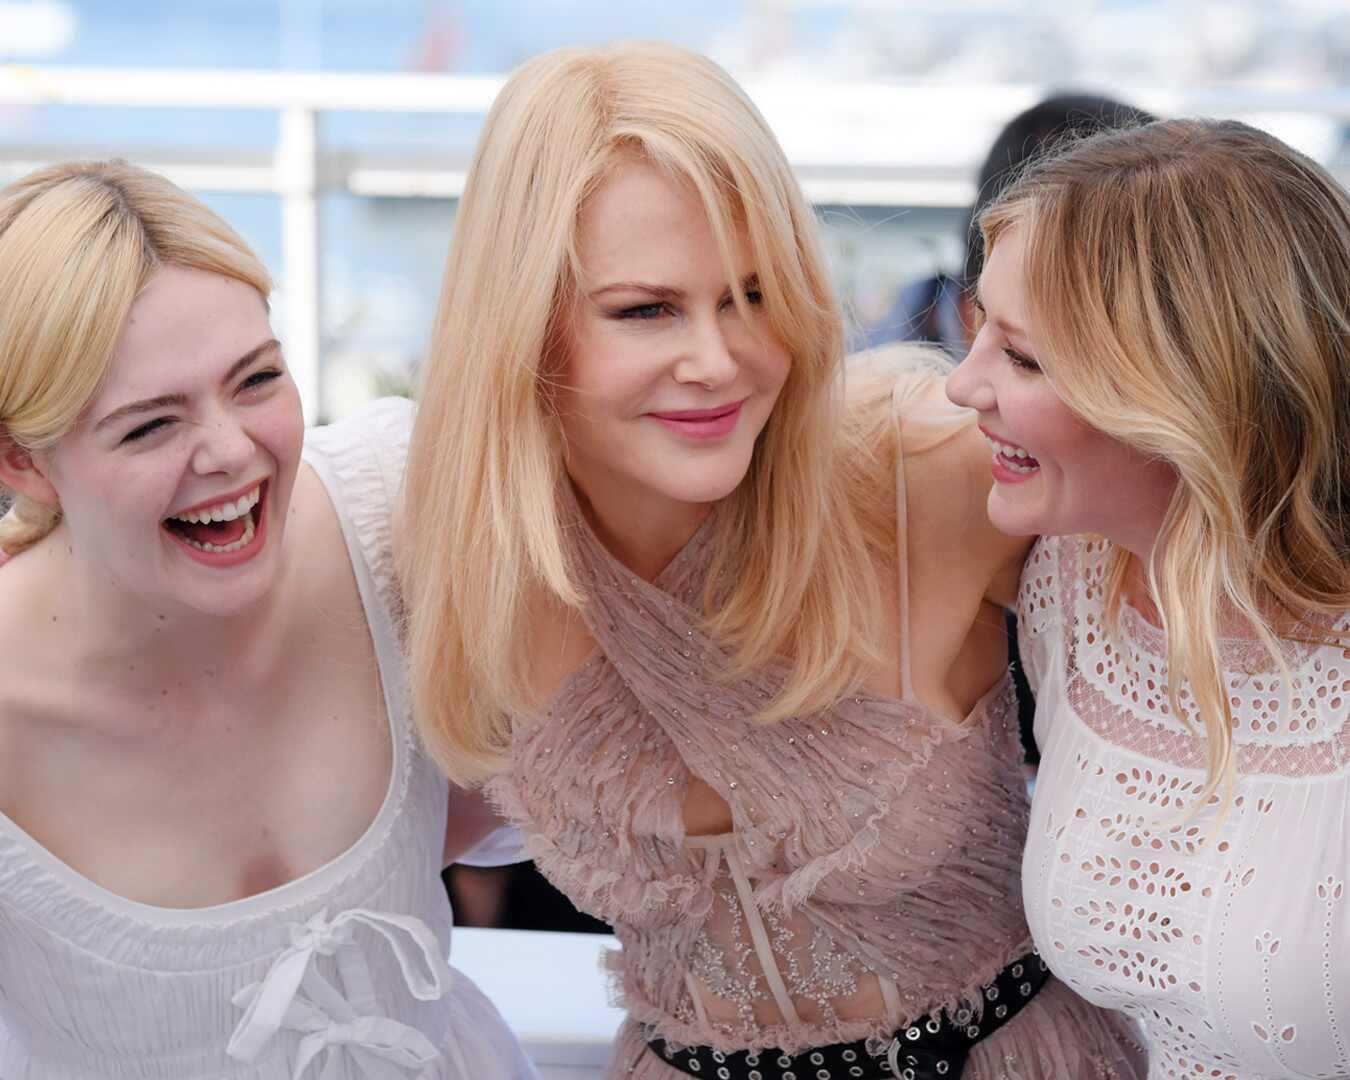 ESC: Cannes Street Style, Elle Fanning, Nicole Kidman and Kirsten Dunst